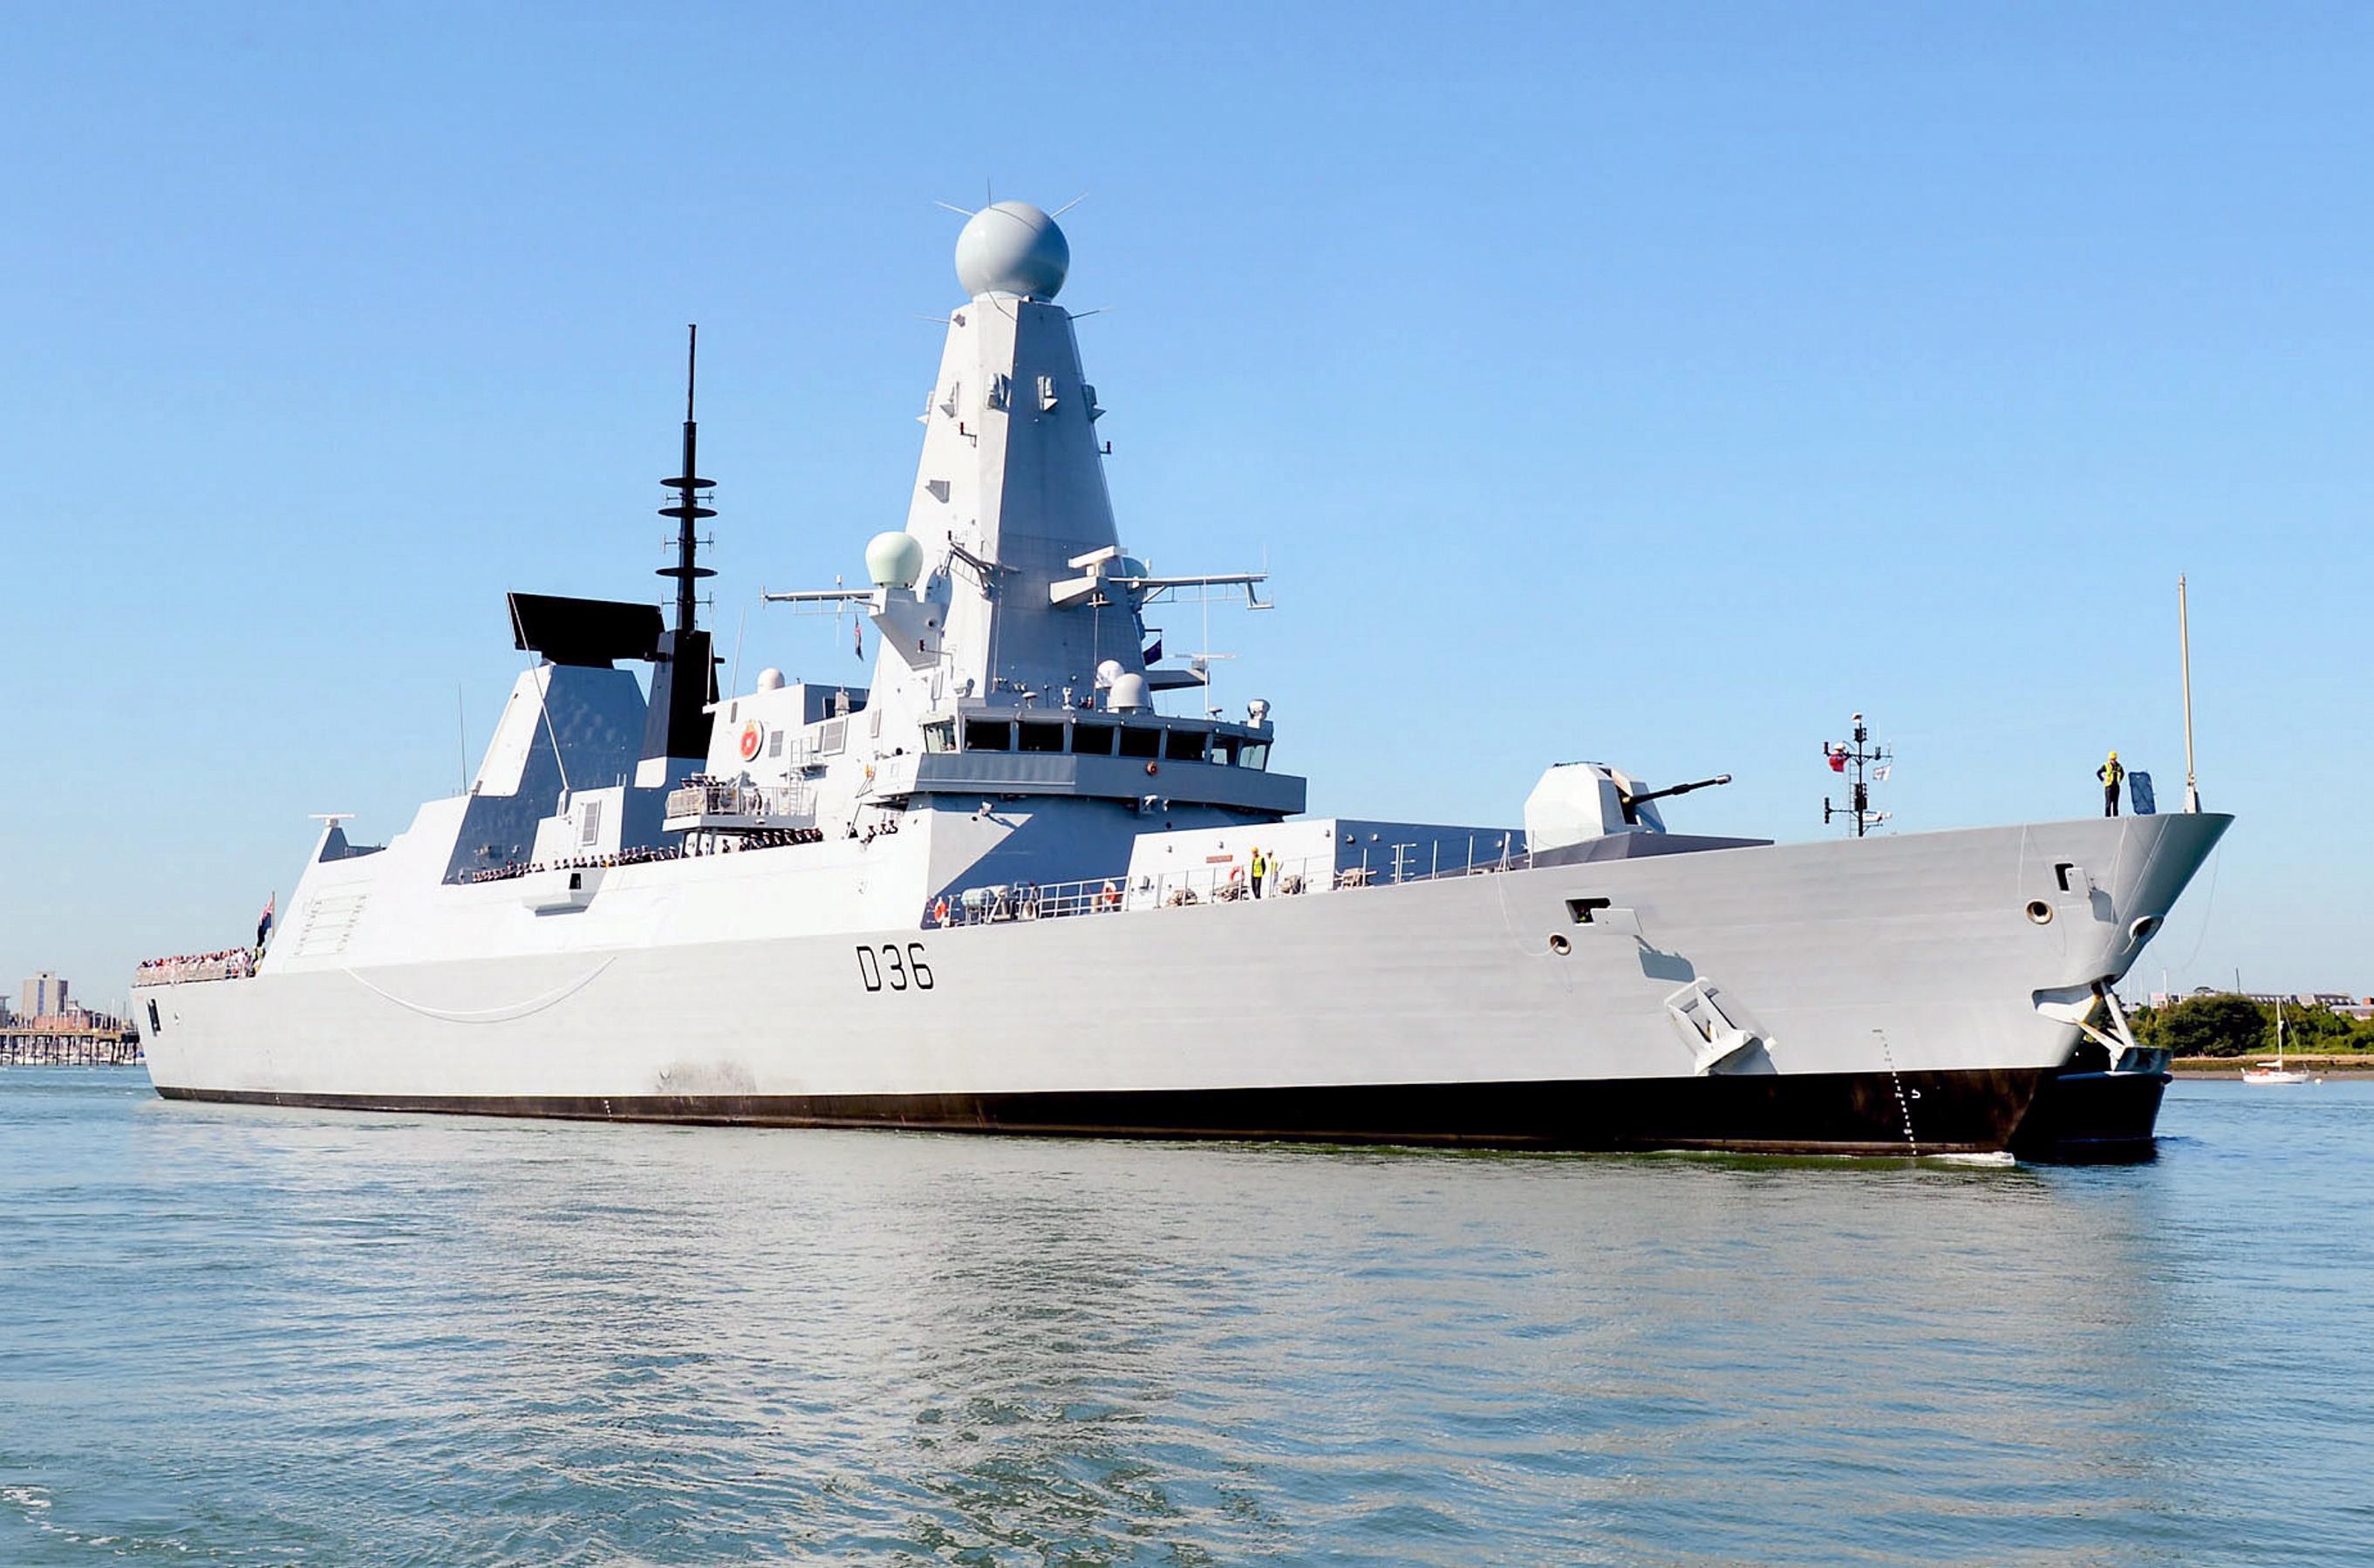 HMS Defender (D36) - Wikipedia